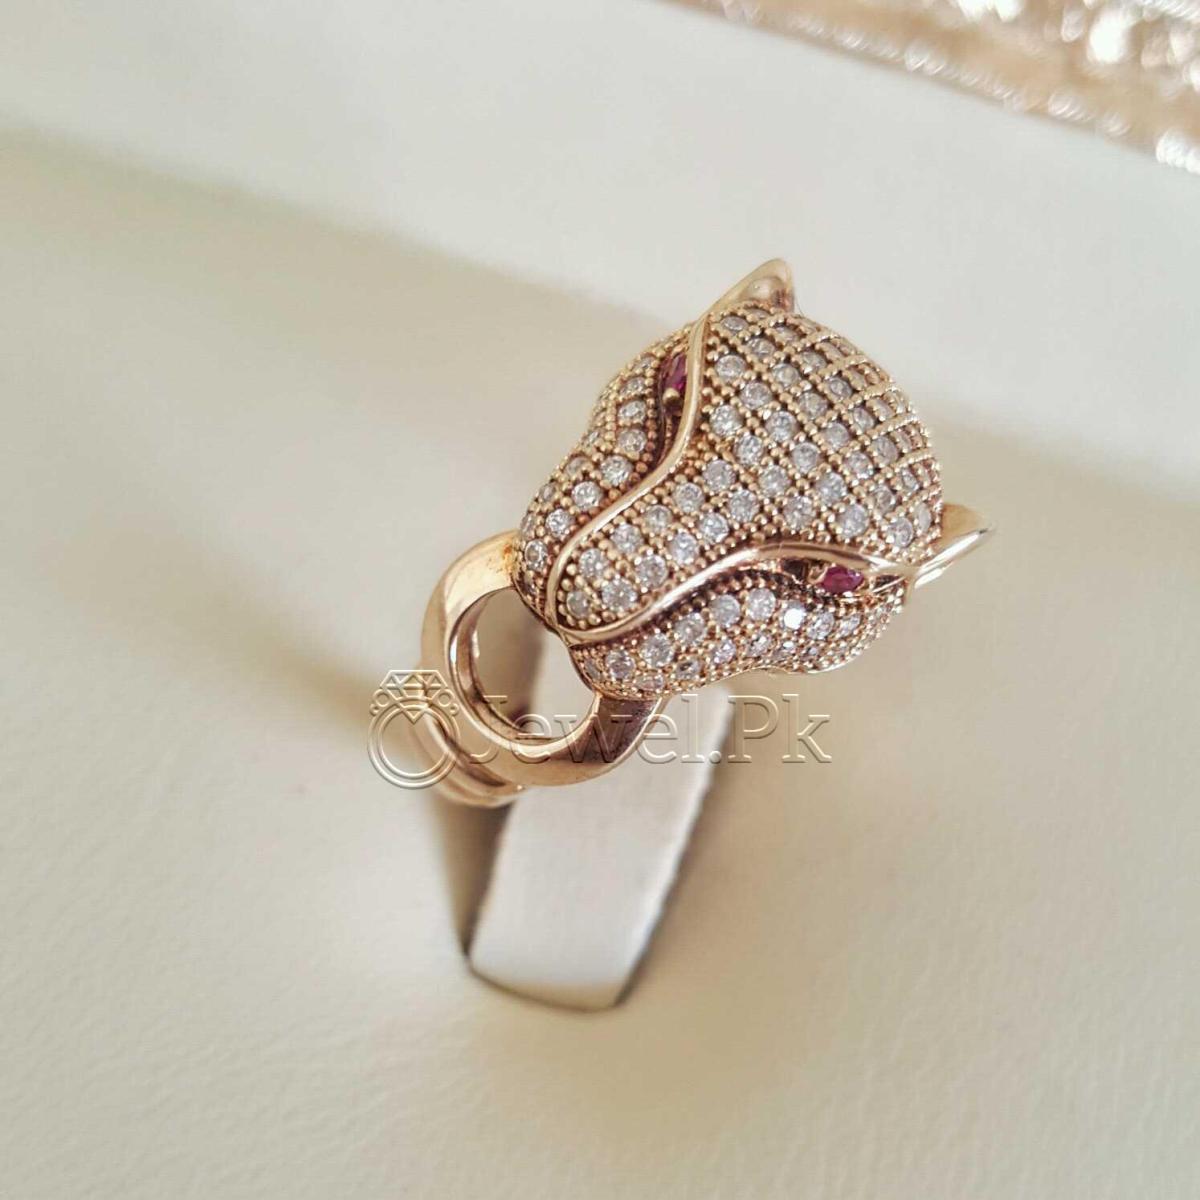 925 Silver Luxury Rings for Ladies Women Silver Rings Woman Handmade Rings 9 natural gemstones pakistan + 925 silver jewelry online